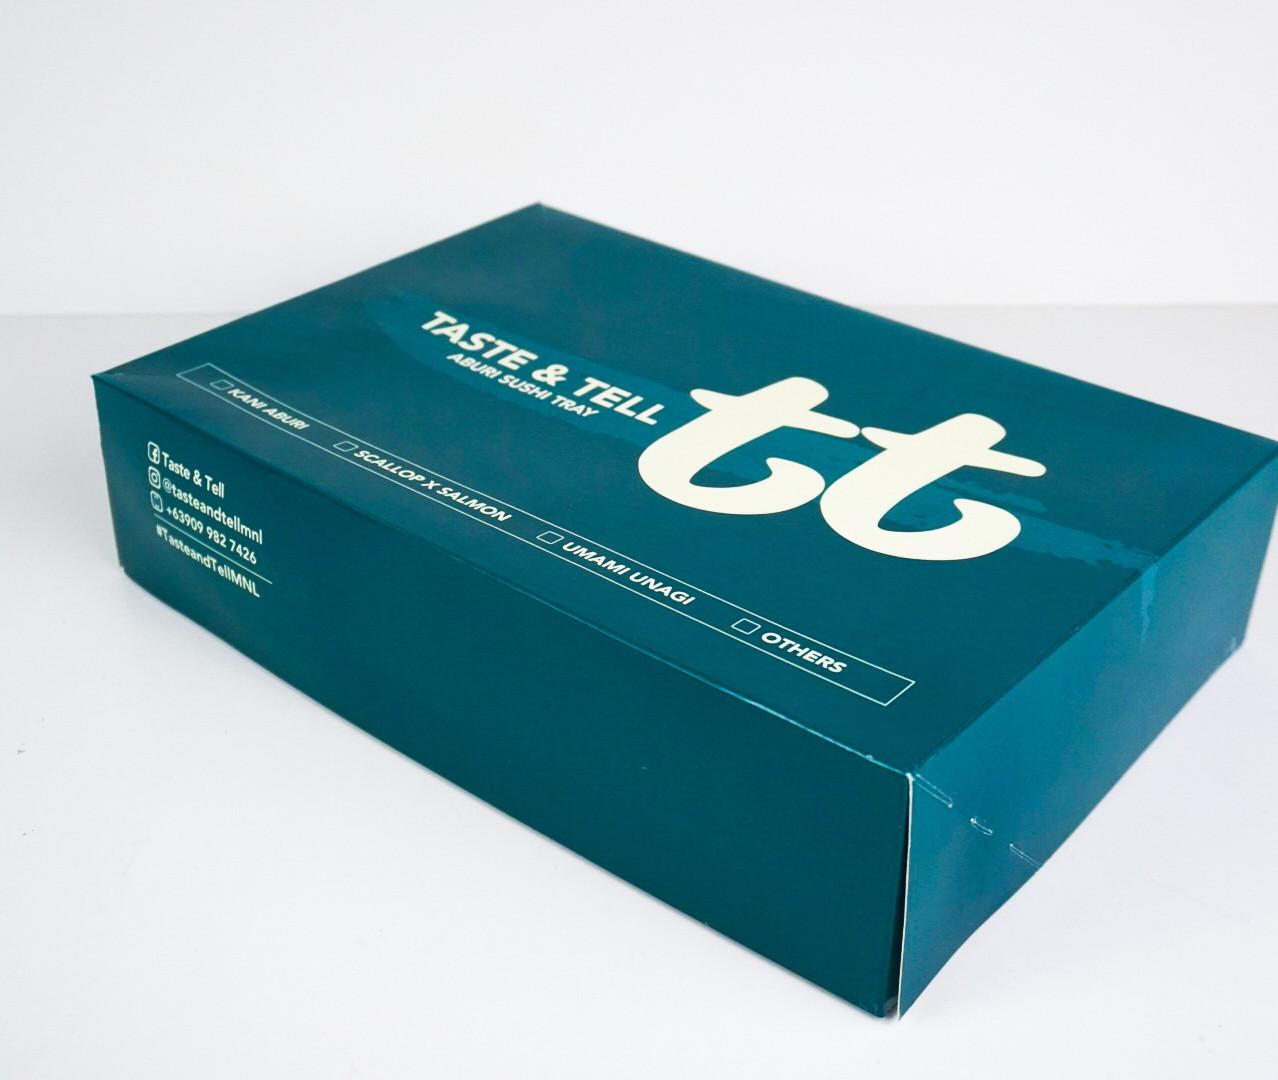 DSC09022.JPG